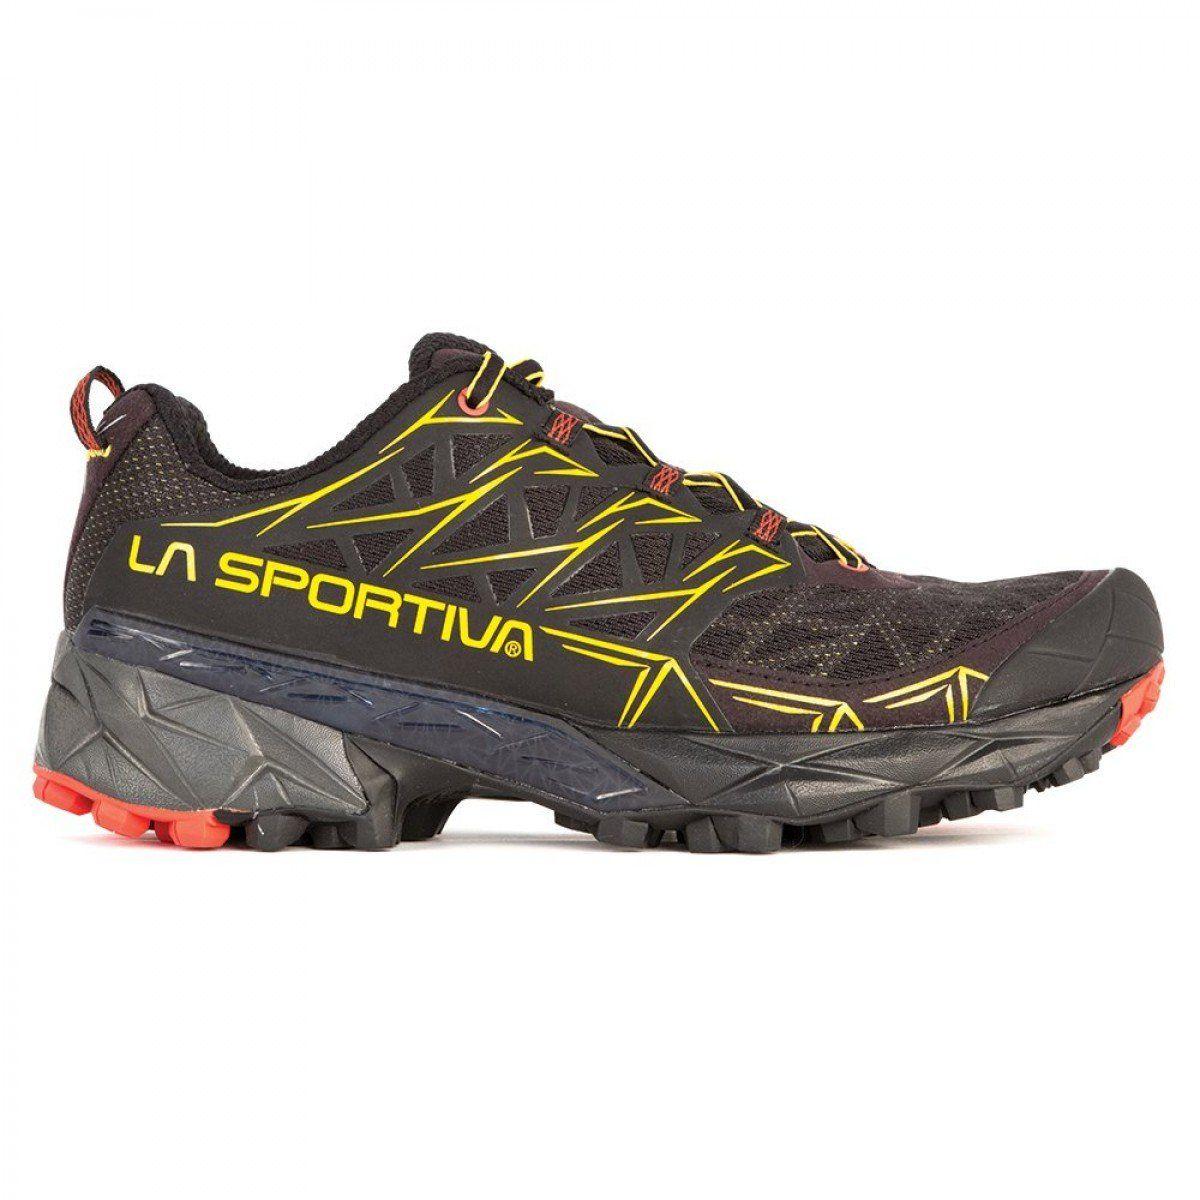 La Sportiva Akyra Trail Running Laufschuhe grau